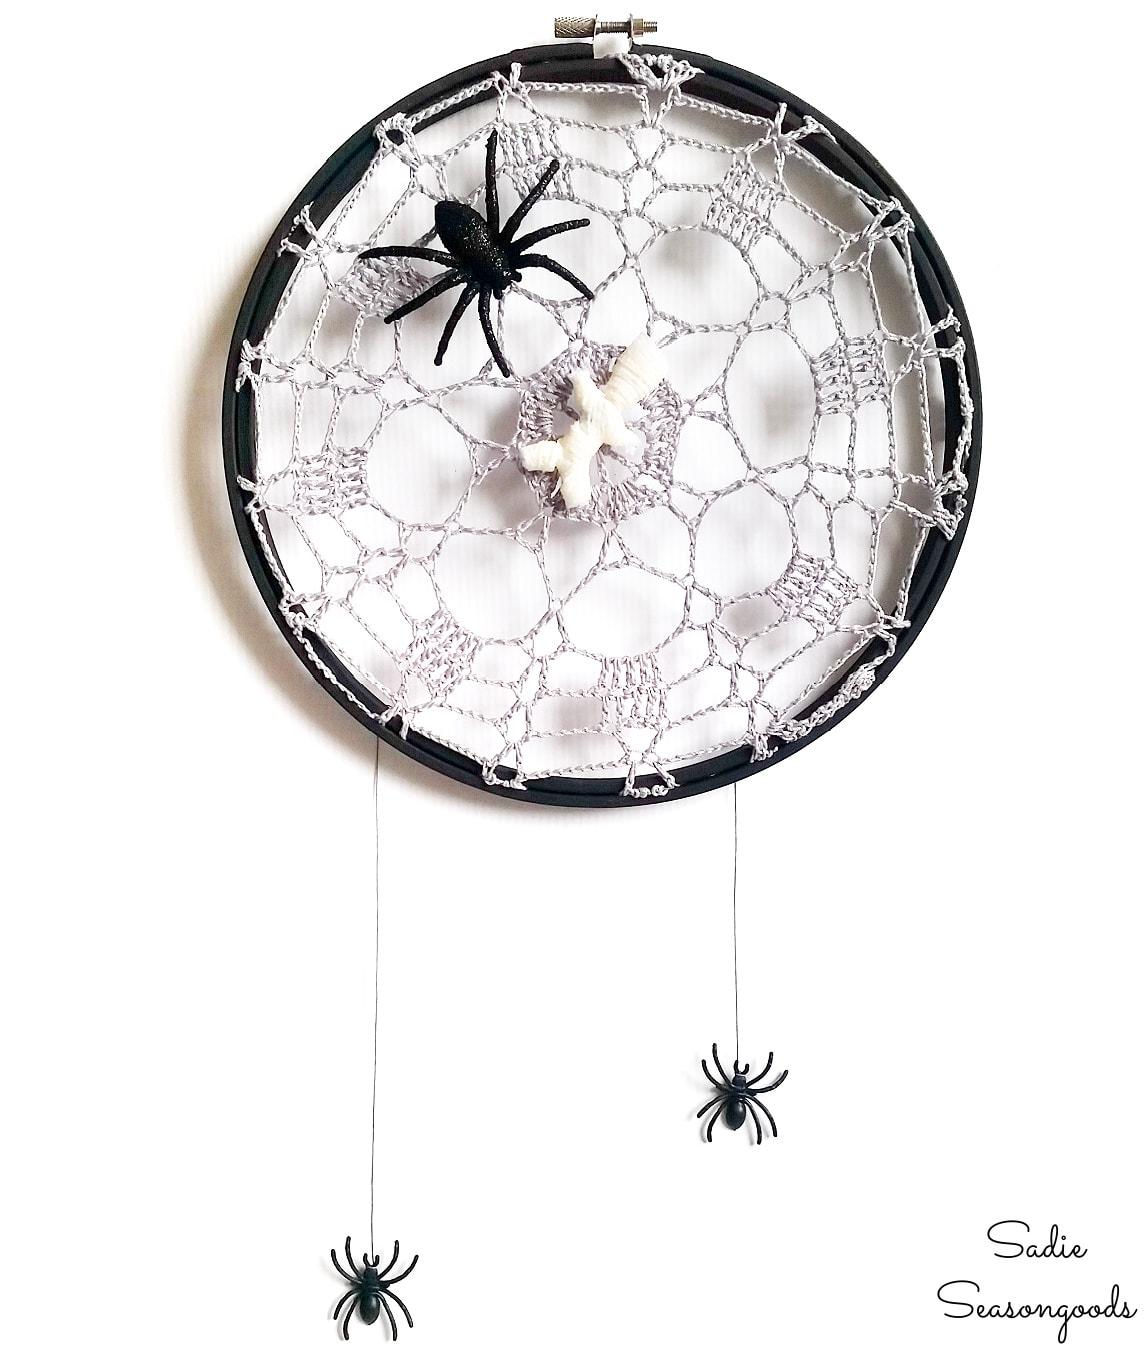 Spider Web Decor for Halloween